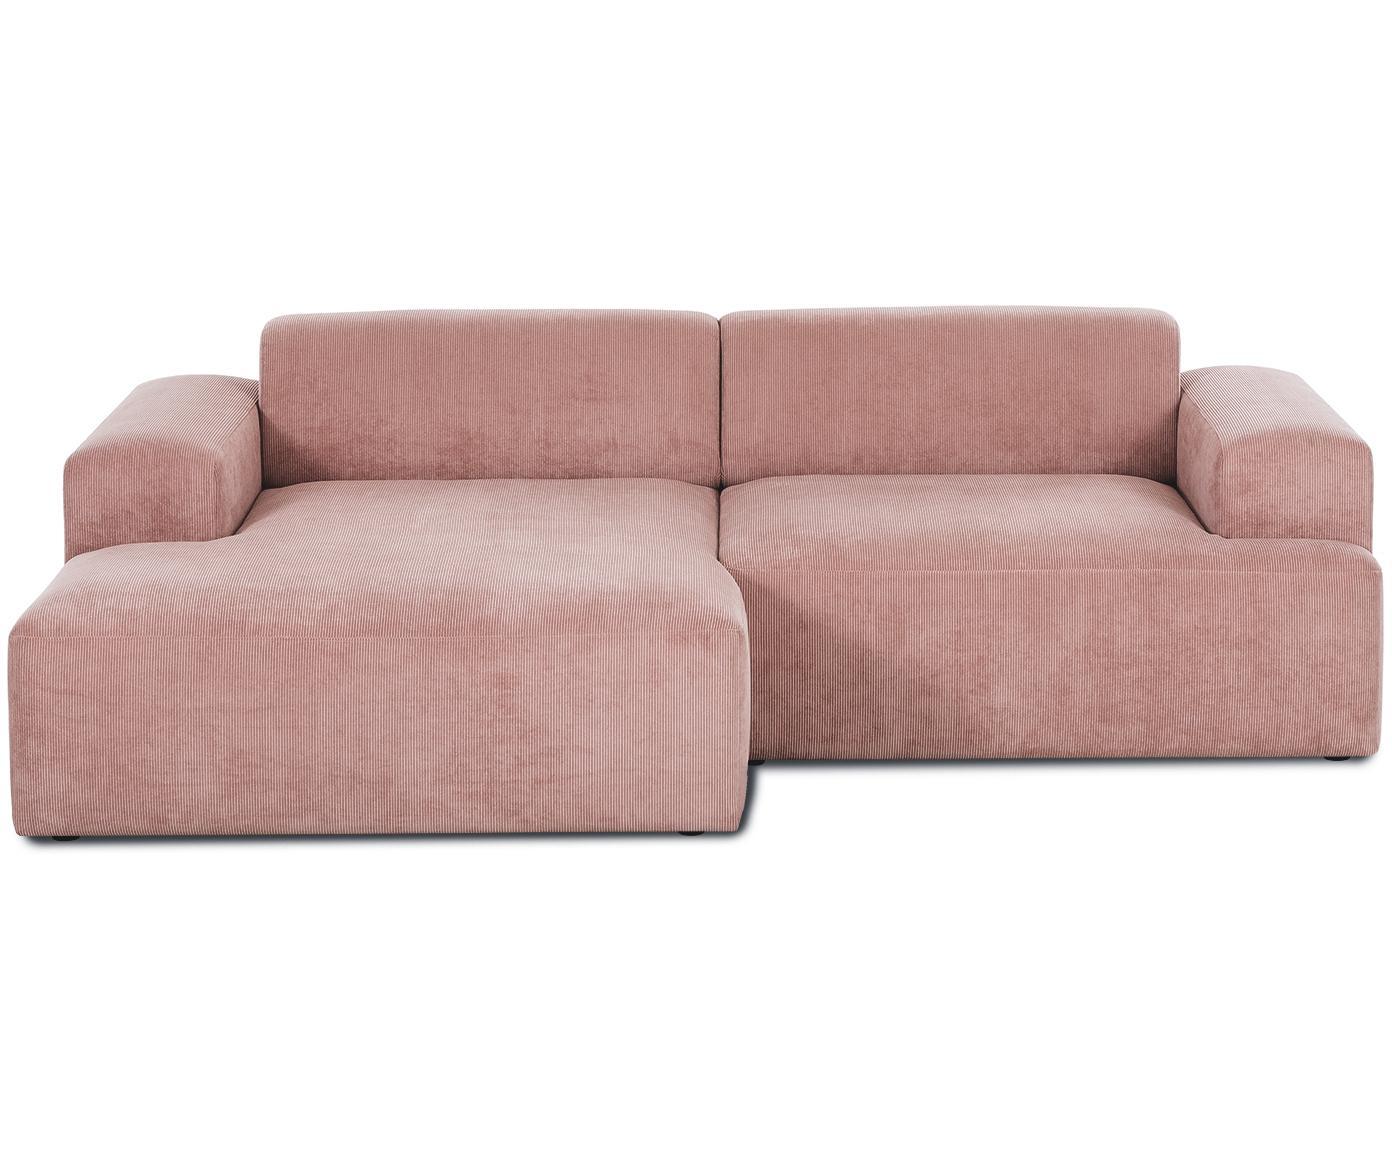 Cord-Ecksofa Melva (3-Sitzer), Bezug: Cord (92% Polyester, 8% P, Gestell: Massives Kiefernholz, Spa, Cord Rosa, B 240 x T 144 cm